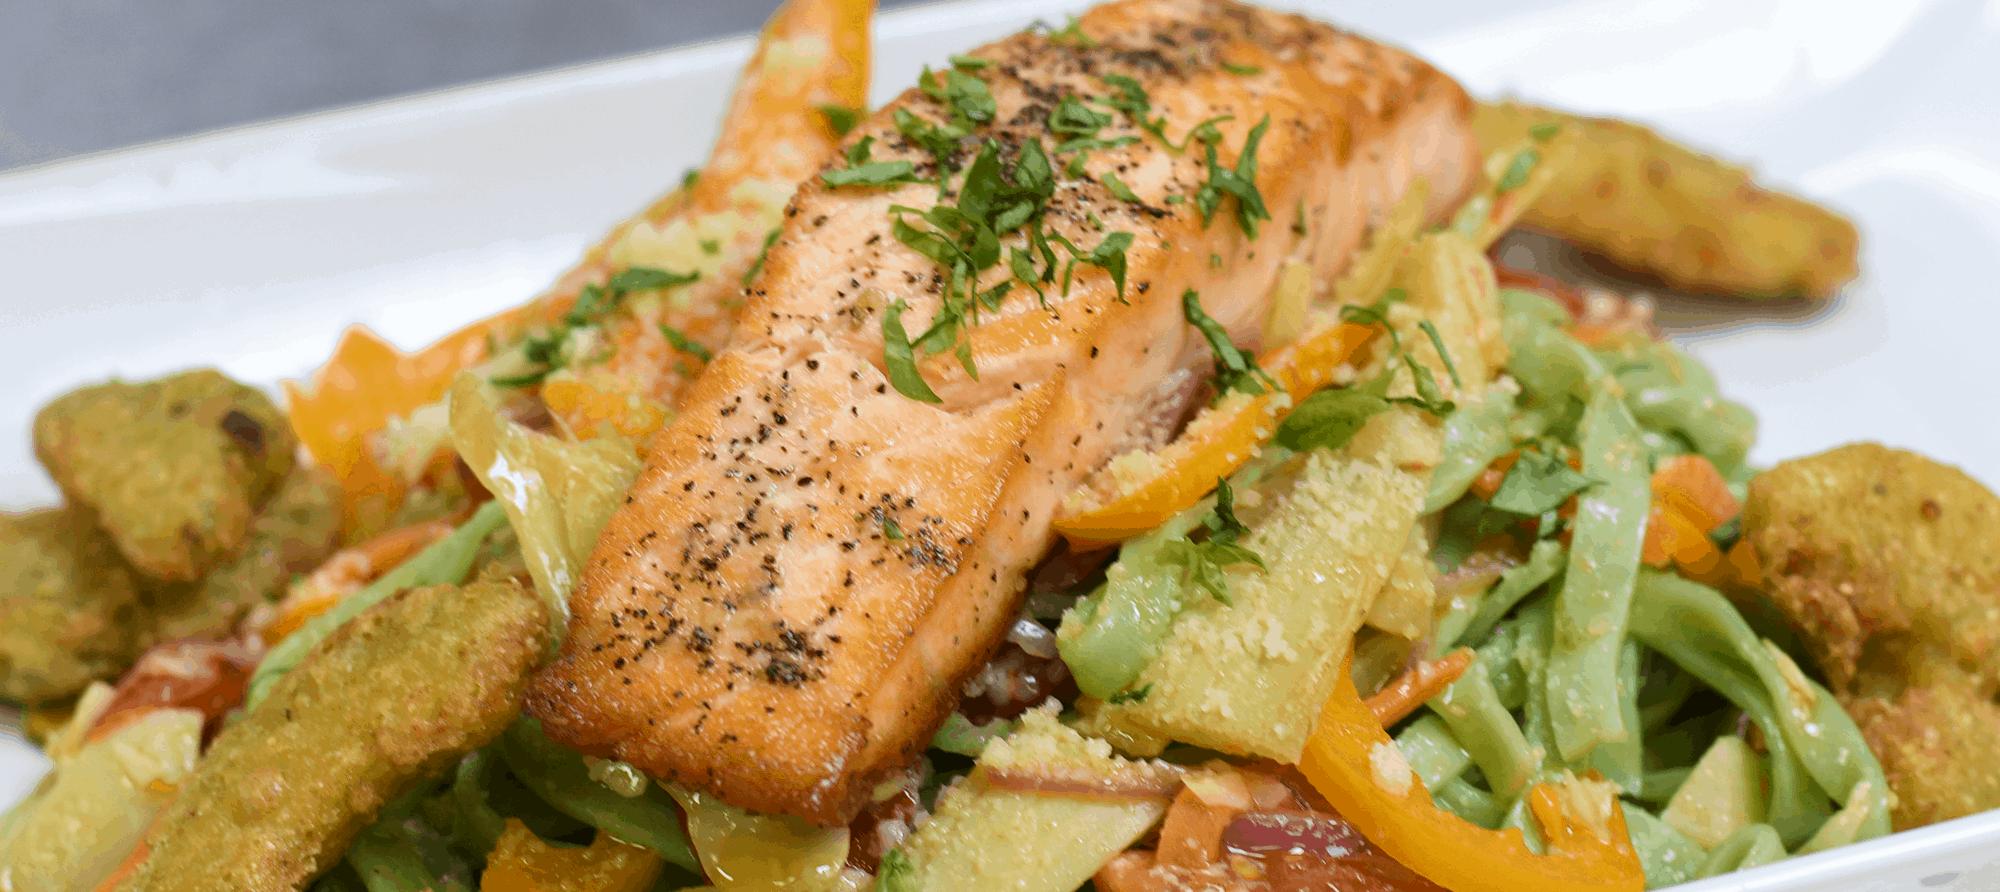 Grilled Capri Salmon, Served with Vegetable Fettuccini Noodles, Sautéed Mediterranean Vegetables, Fresh Herbs, Extra Virgin Olive Oil, & Garlic